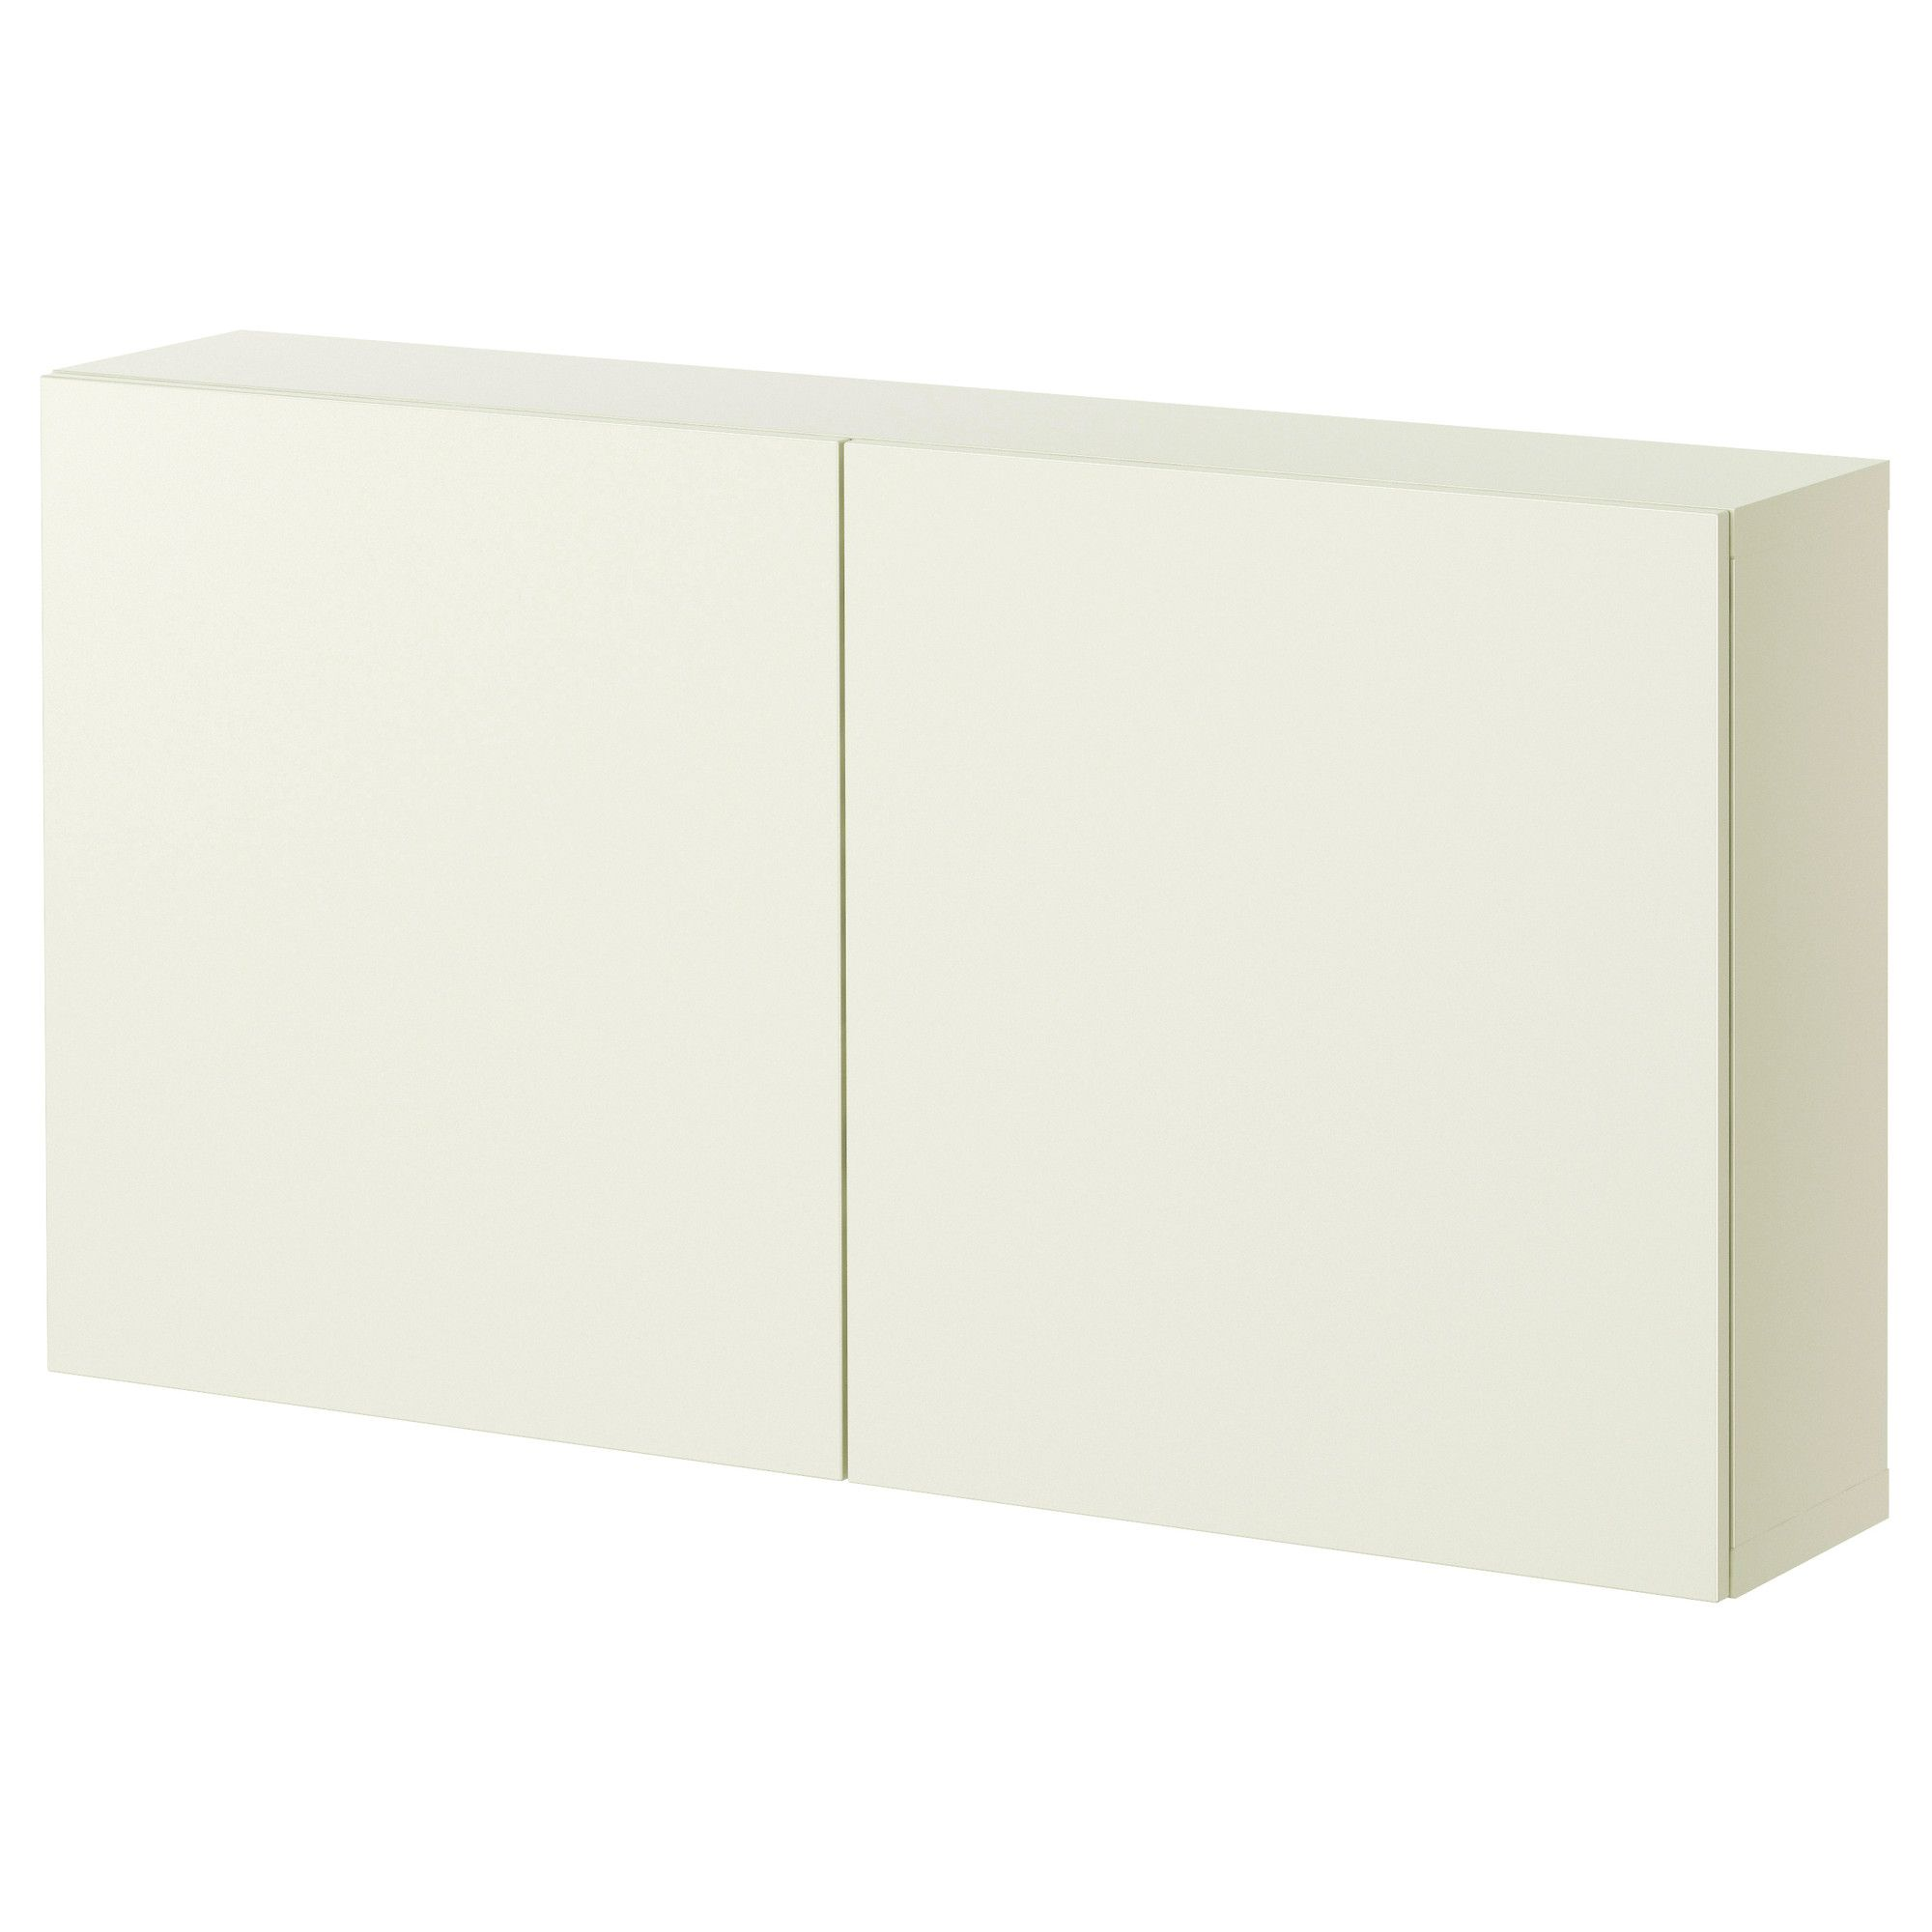 IKEA | BESTÅ Shelf Unit With Doors   120 X 20 X 64cm $120 | HOME | Entrance  | Pinterest | Shelves, Doors And Organizing